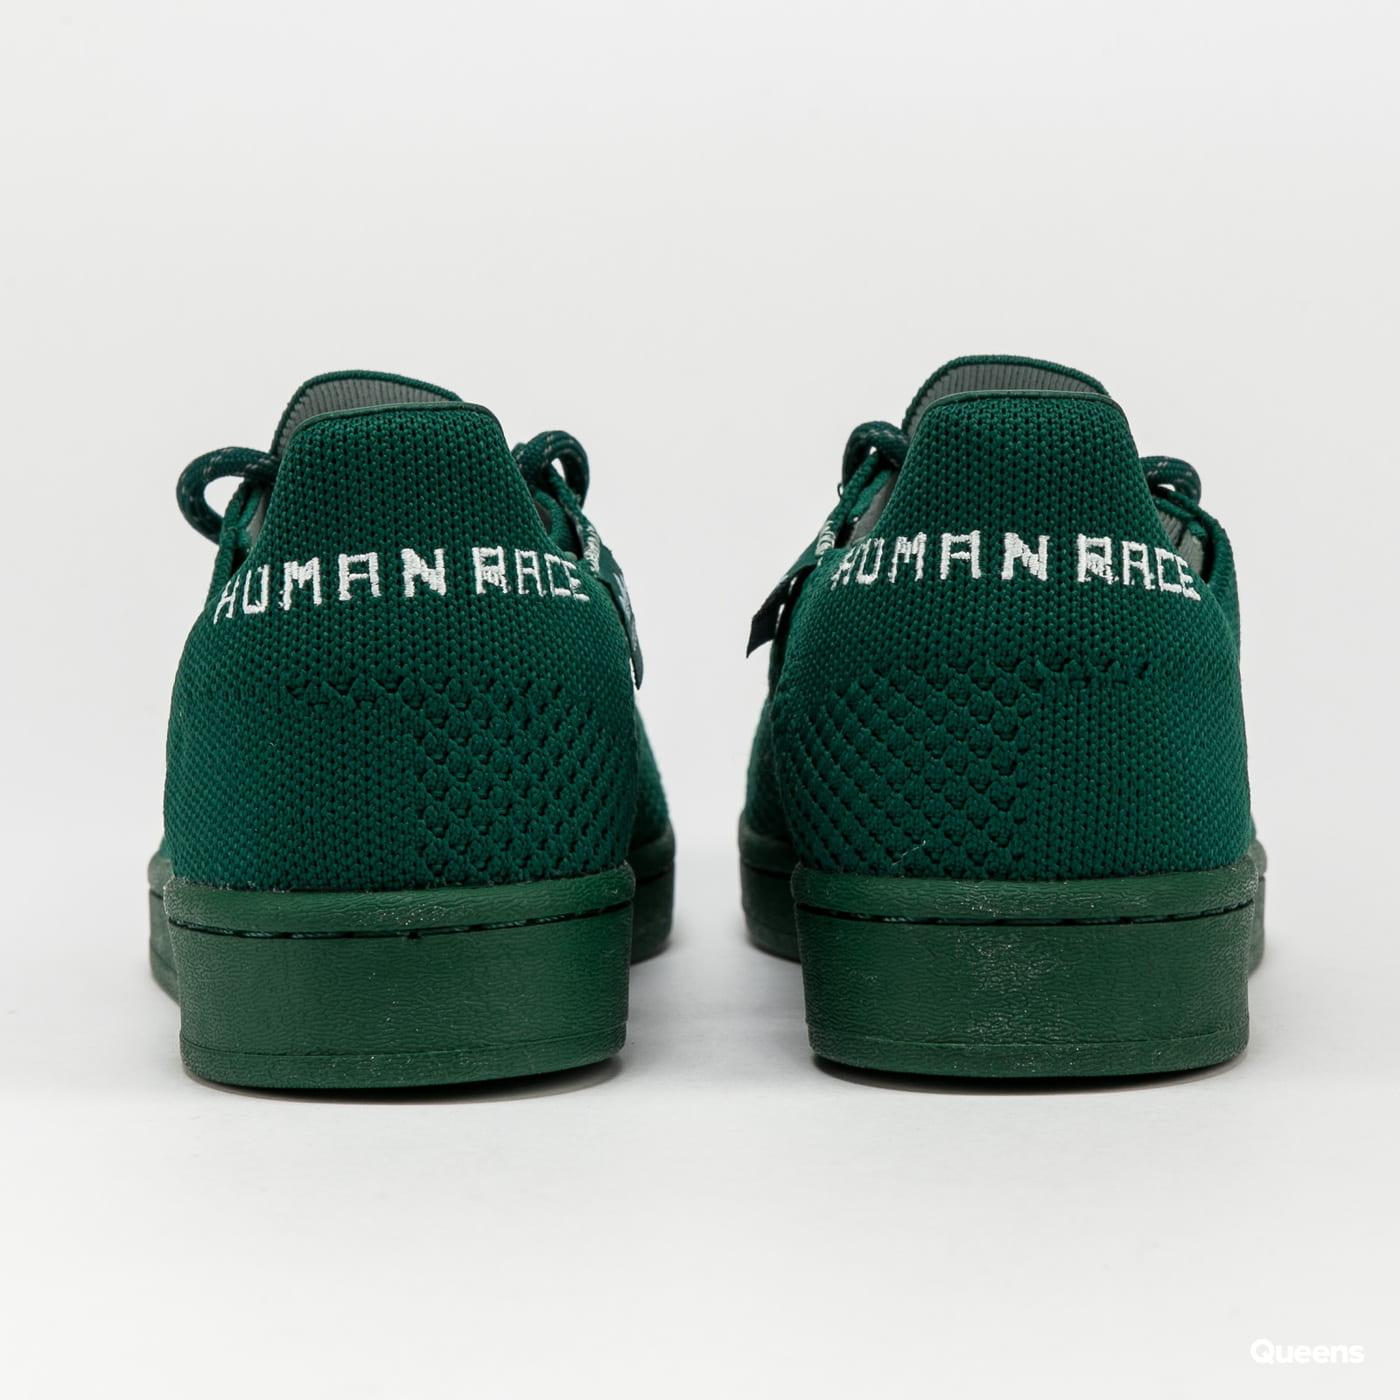 adidas Originals Pharrell Williams Superstar PK drkgrn / drkgrn / skytin